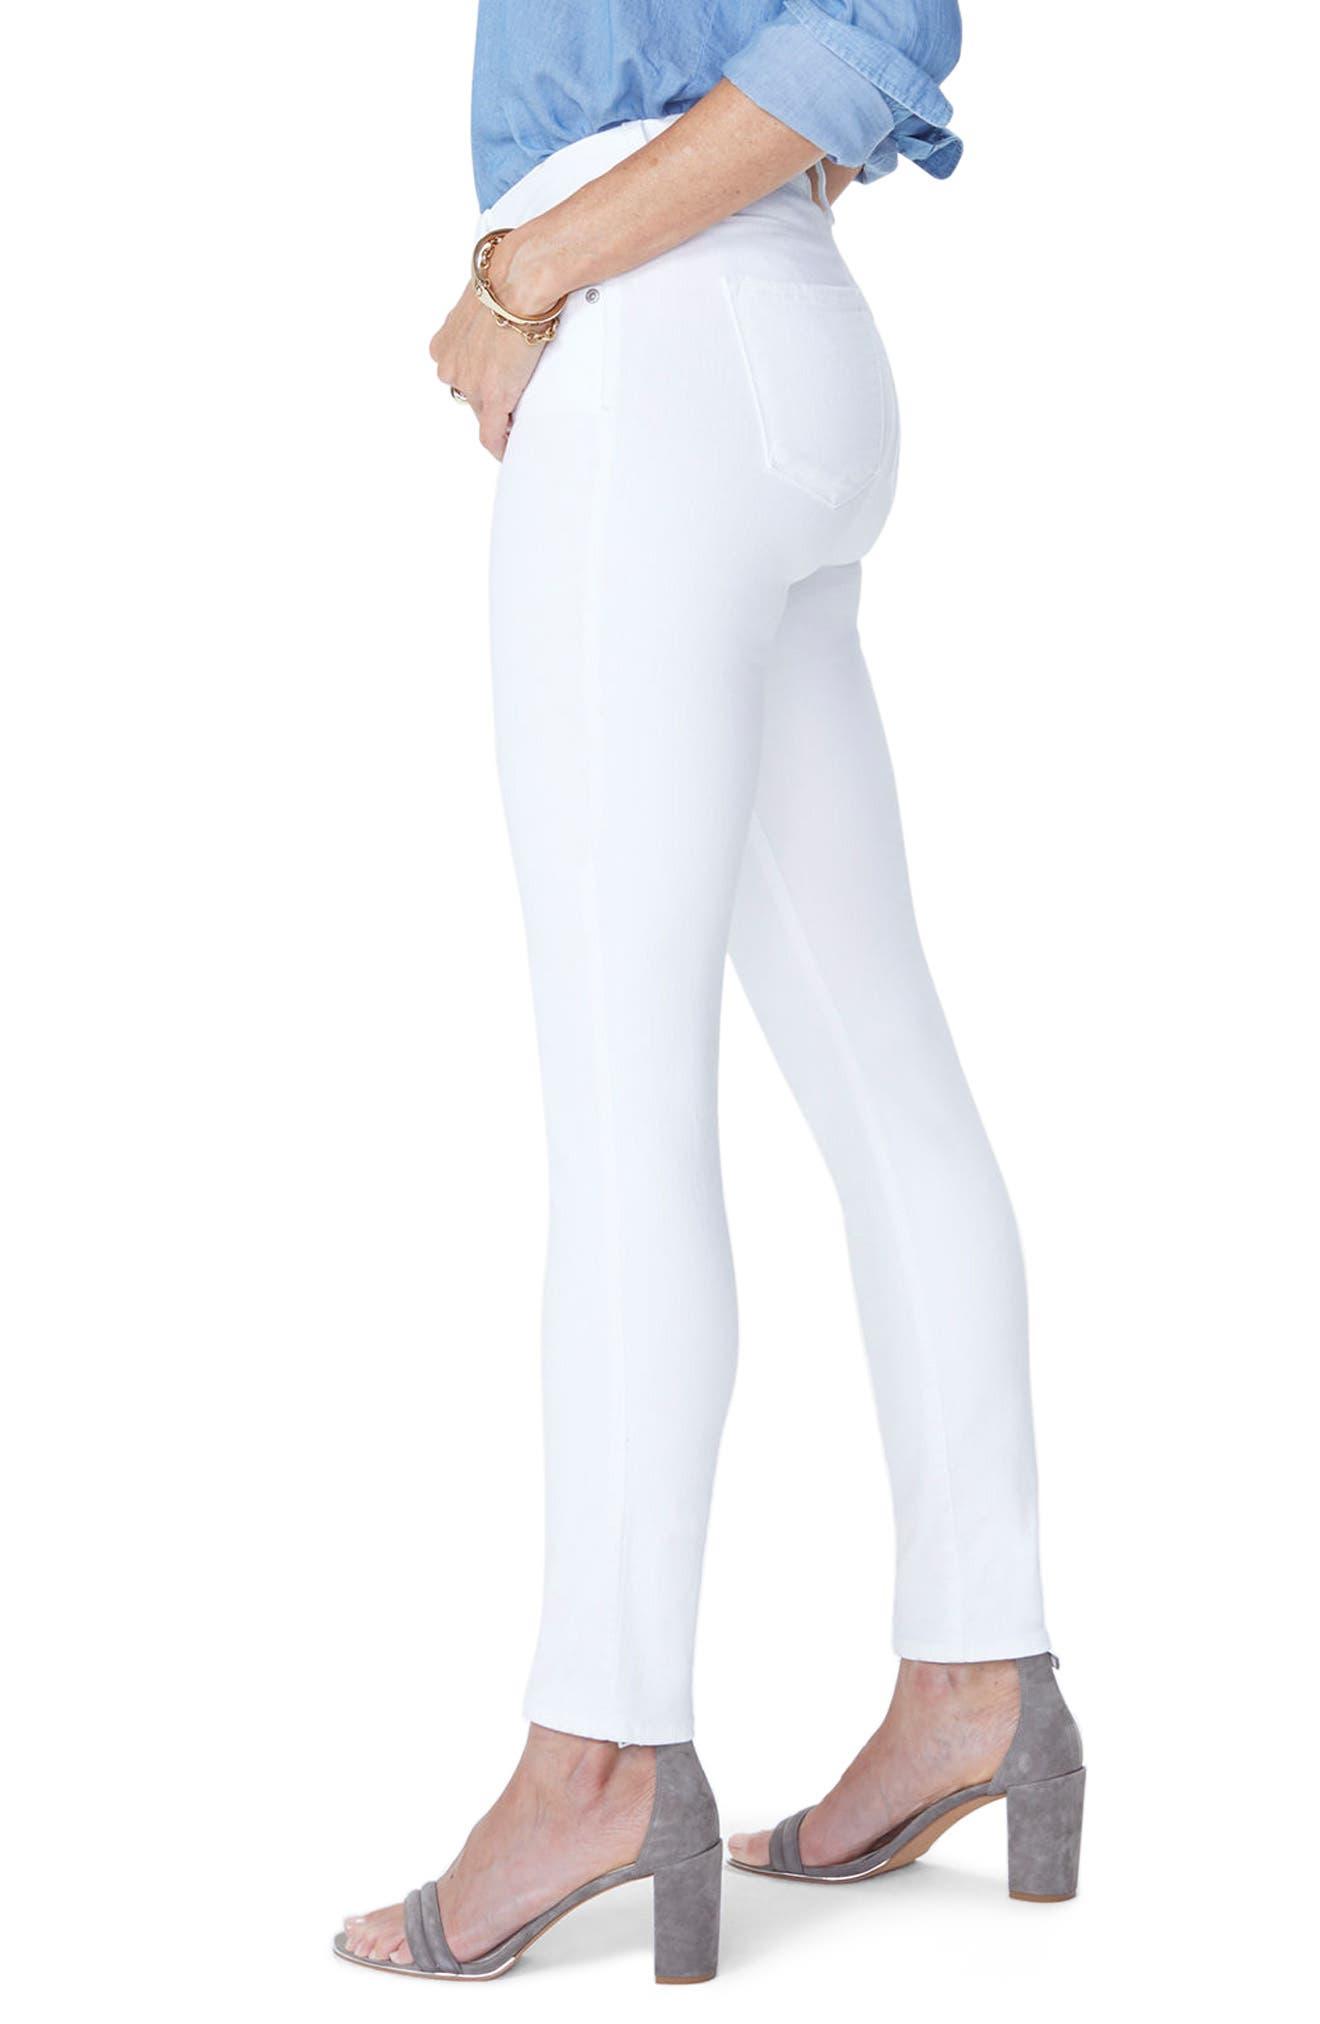 Ami Skinny Jeans,                             Alternate thumbnail 3, color,                             Optic White